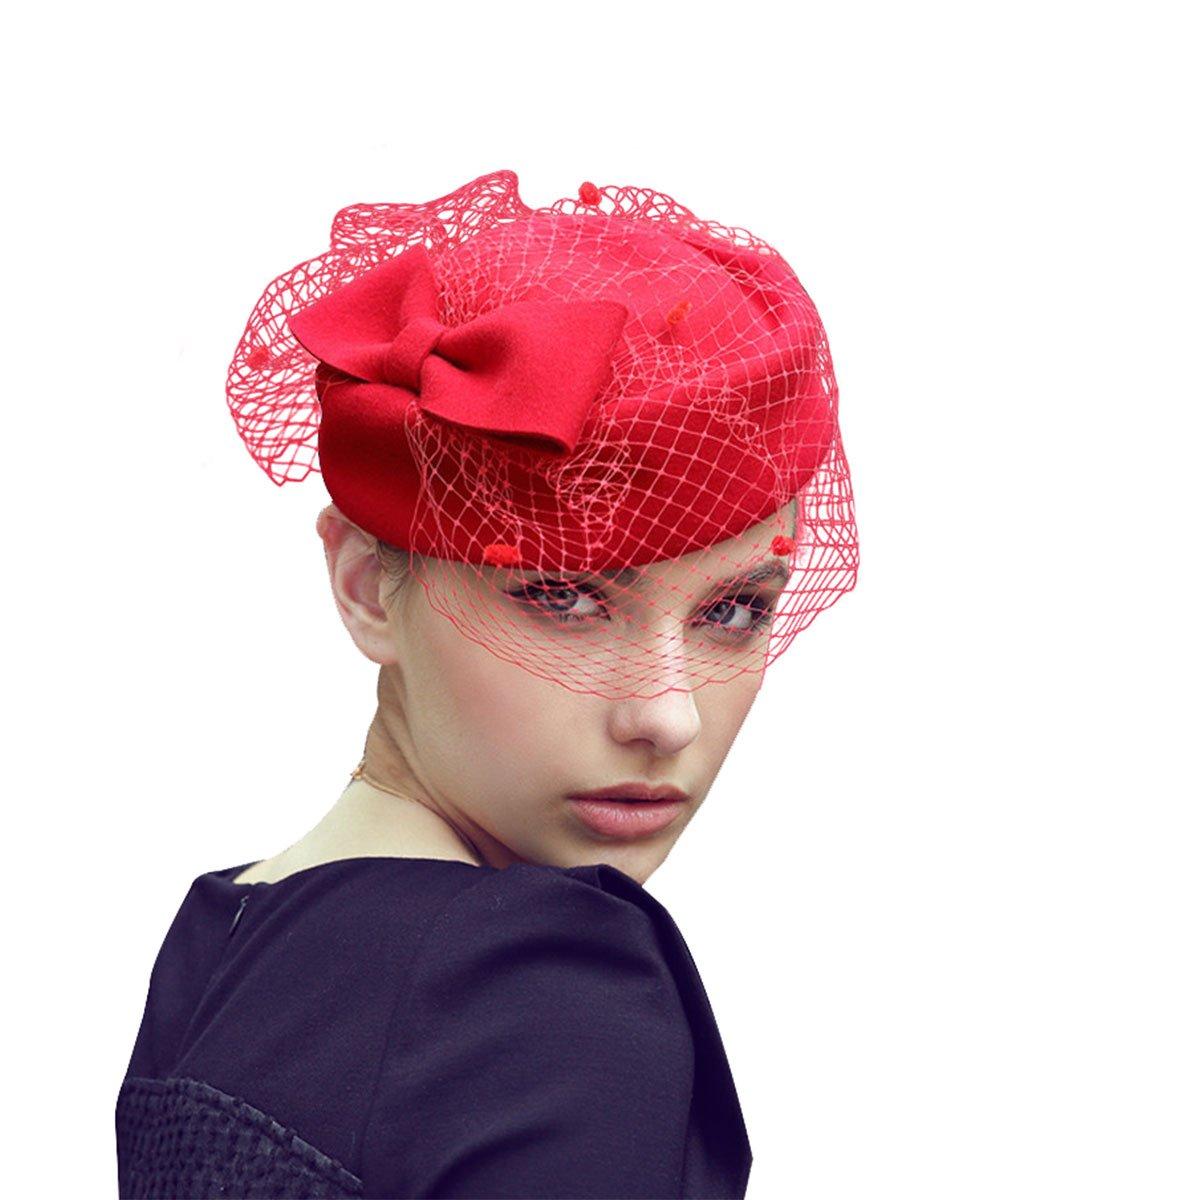 Lawliet Womens Wool Fascinator Retro Pillbox Hat Wool Felt Cocktail Party Wedding Bow Veil A080Black